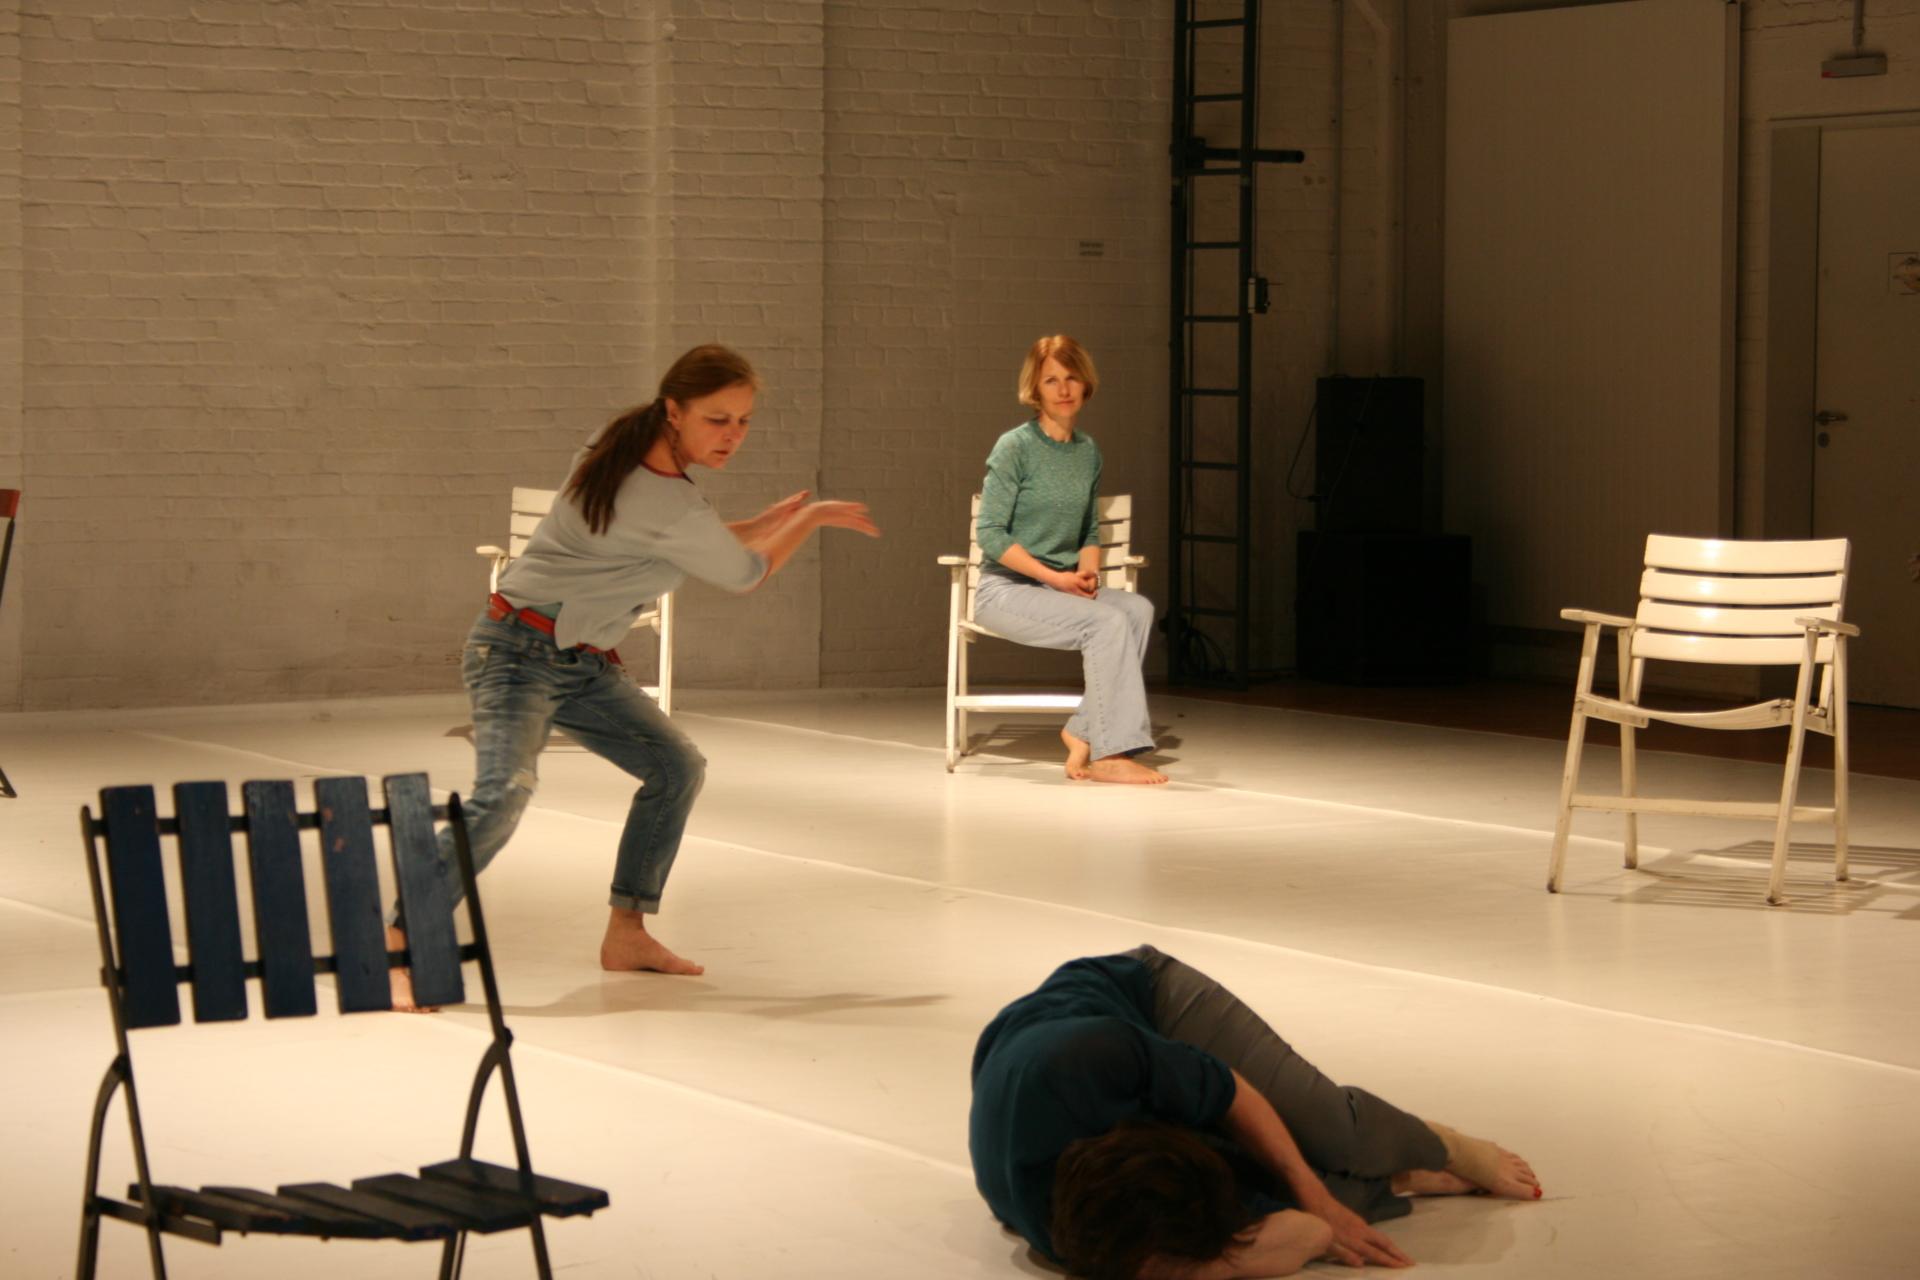 laboratorium haus 1 Lyd. Tanz/Choreographie – Sssss….